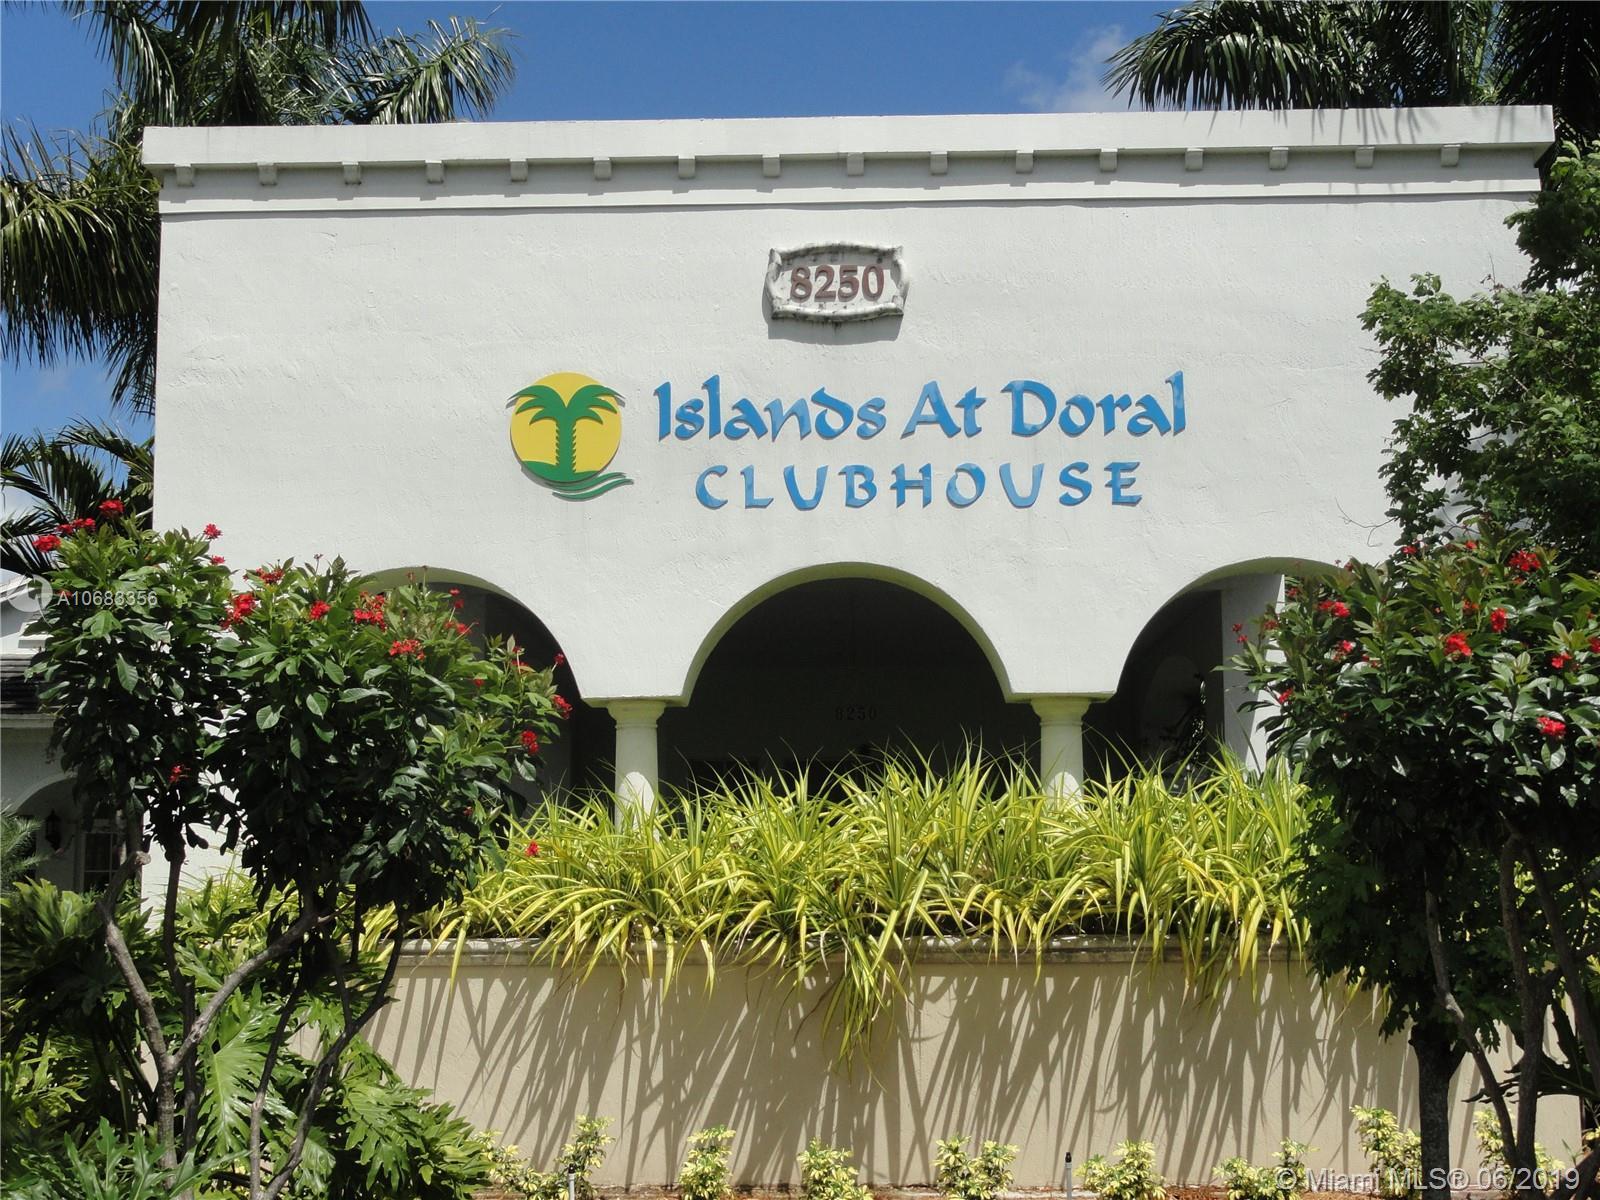 Islands At Doral #11307 - 32 - photo